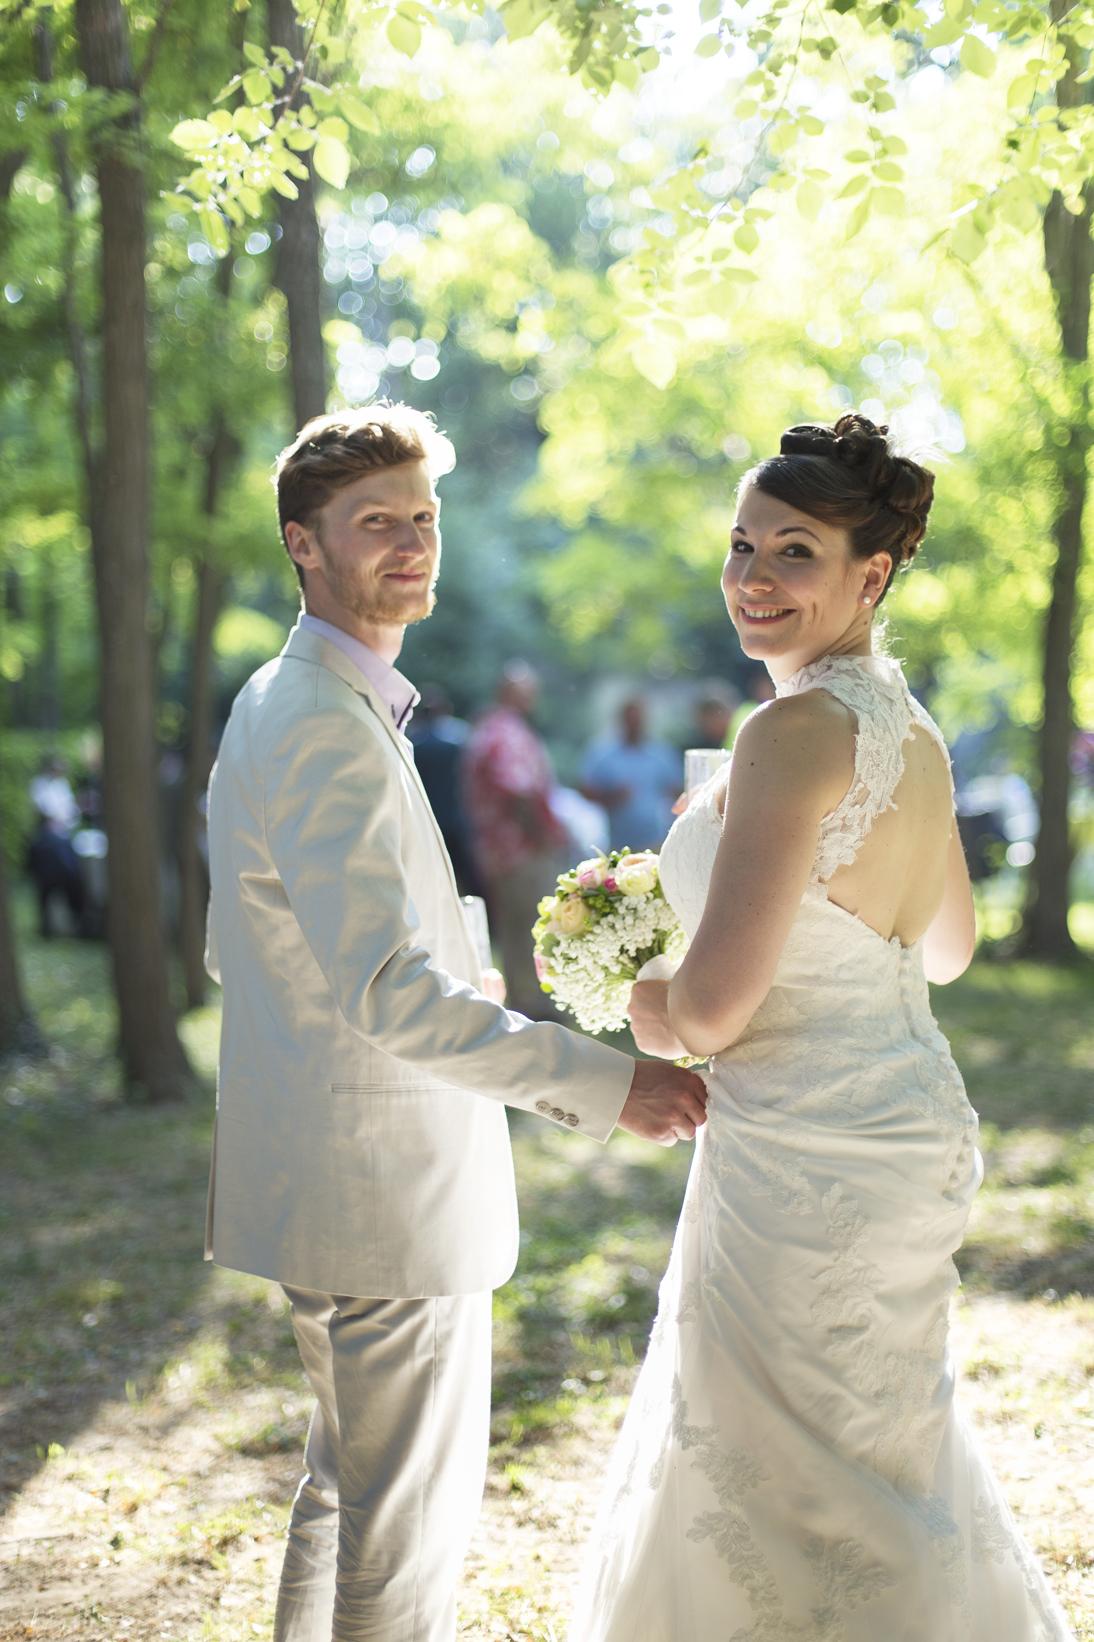 Le mariage coloré et bucolique de Caroline en Provence - photos  Morgane Ruiz et Benjamin Genet (15)